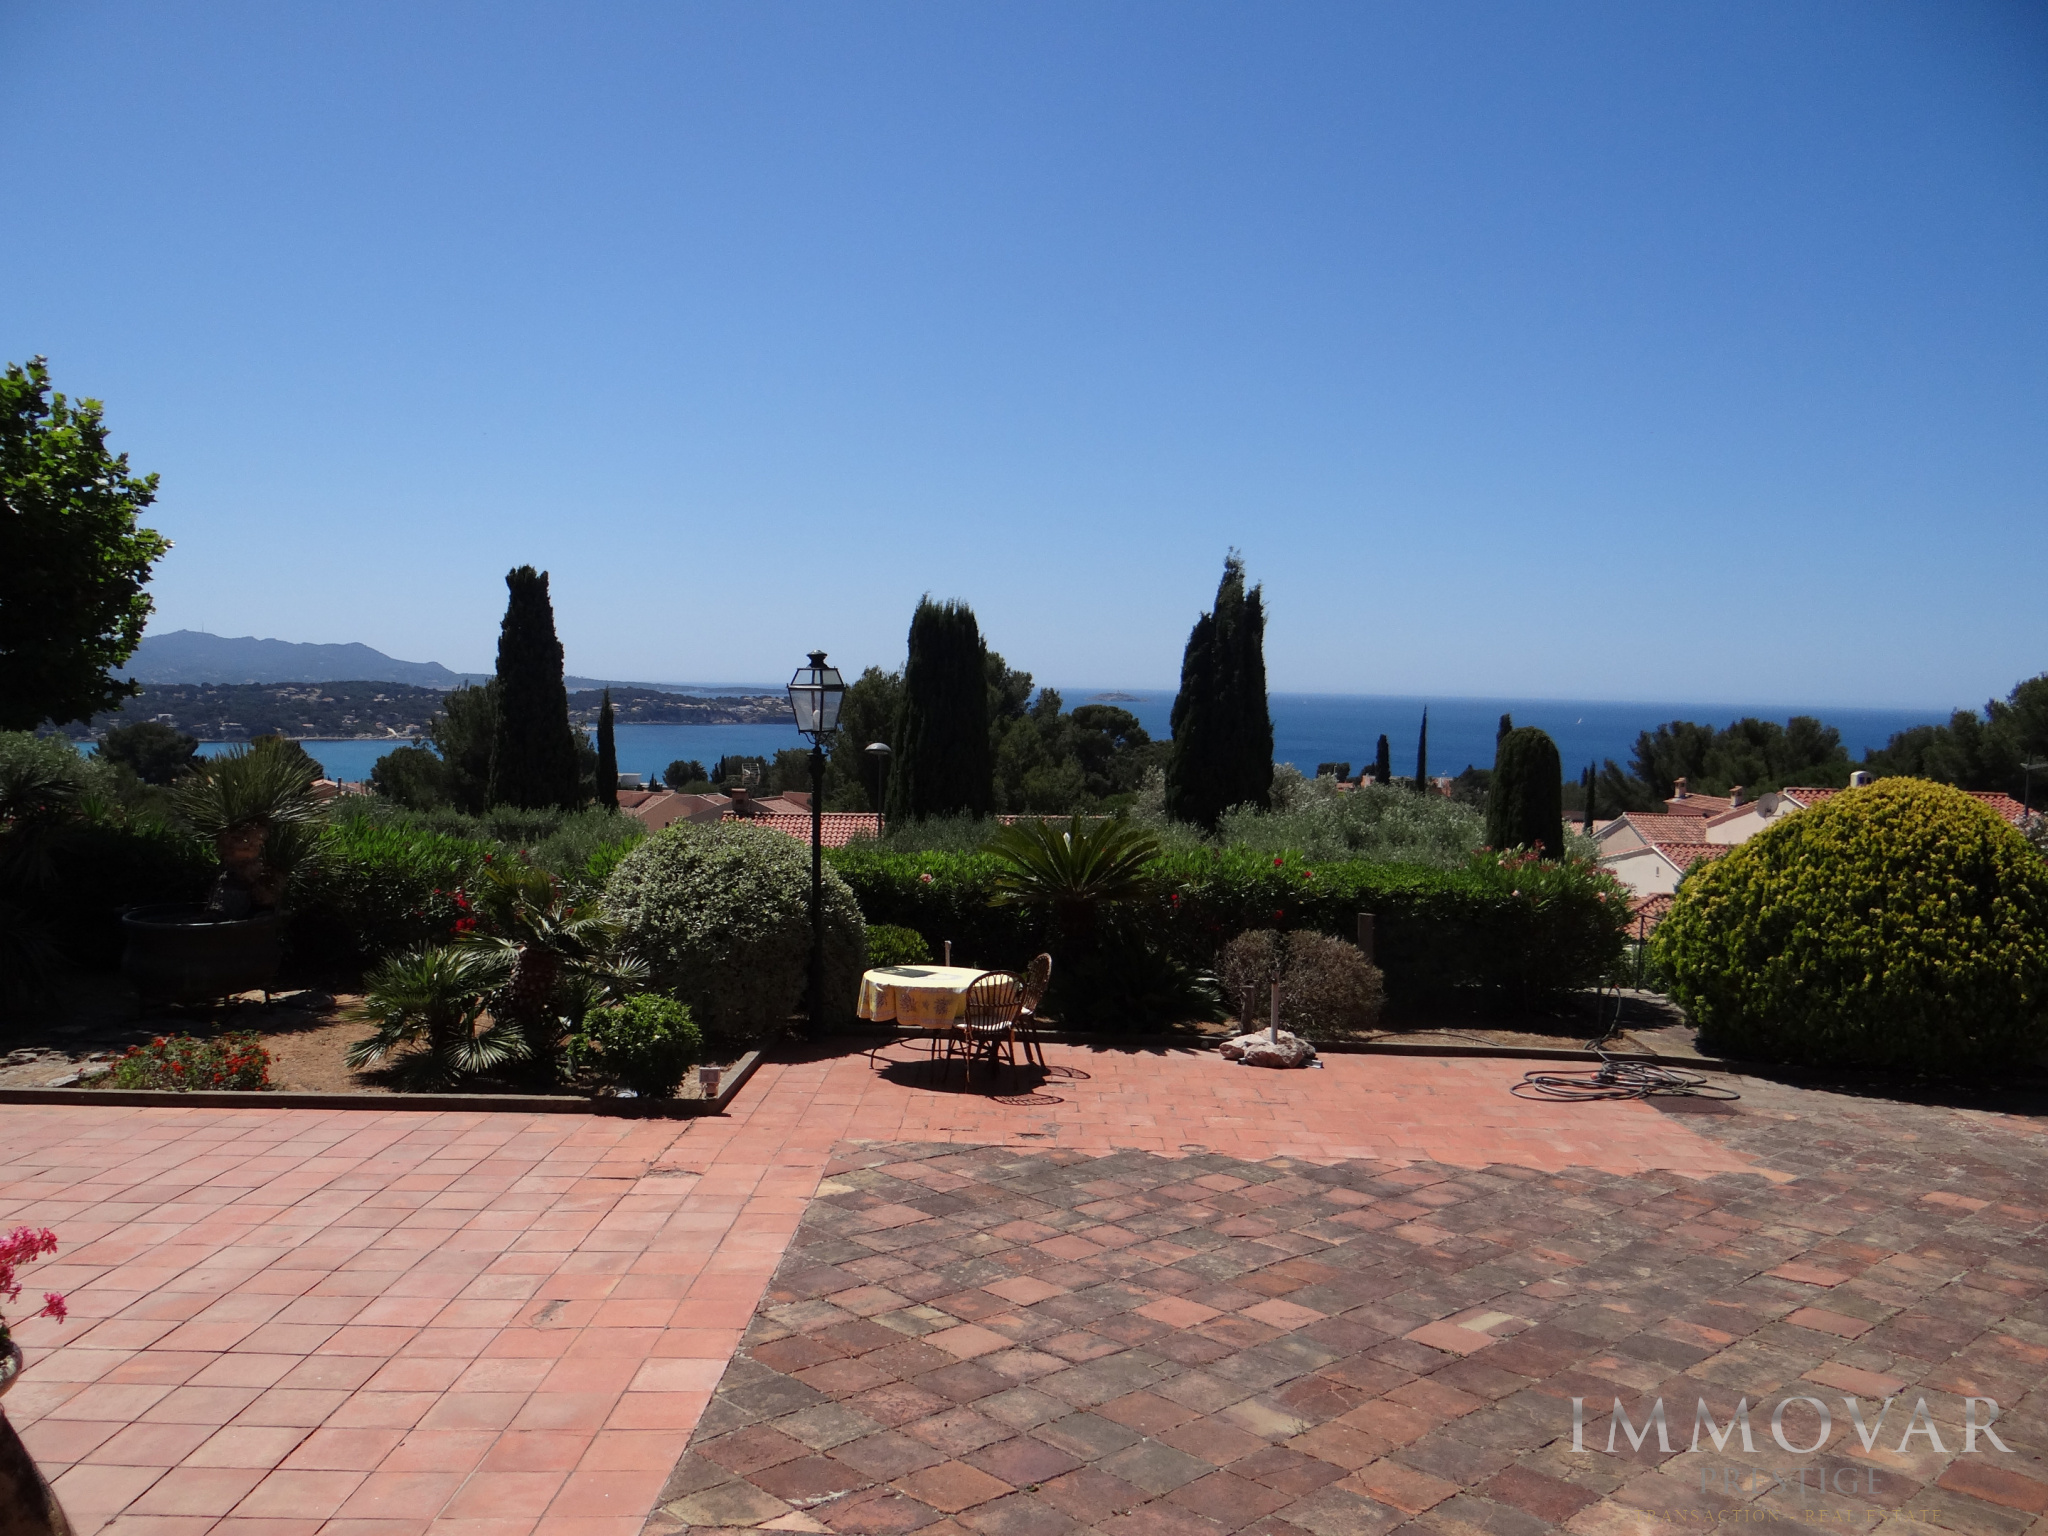 Vente villas luxe St Cyr sur Mer, Bandol, Sanary sur Mer, piscine ...